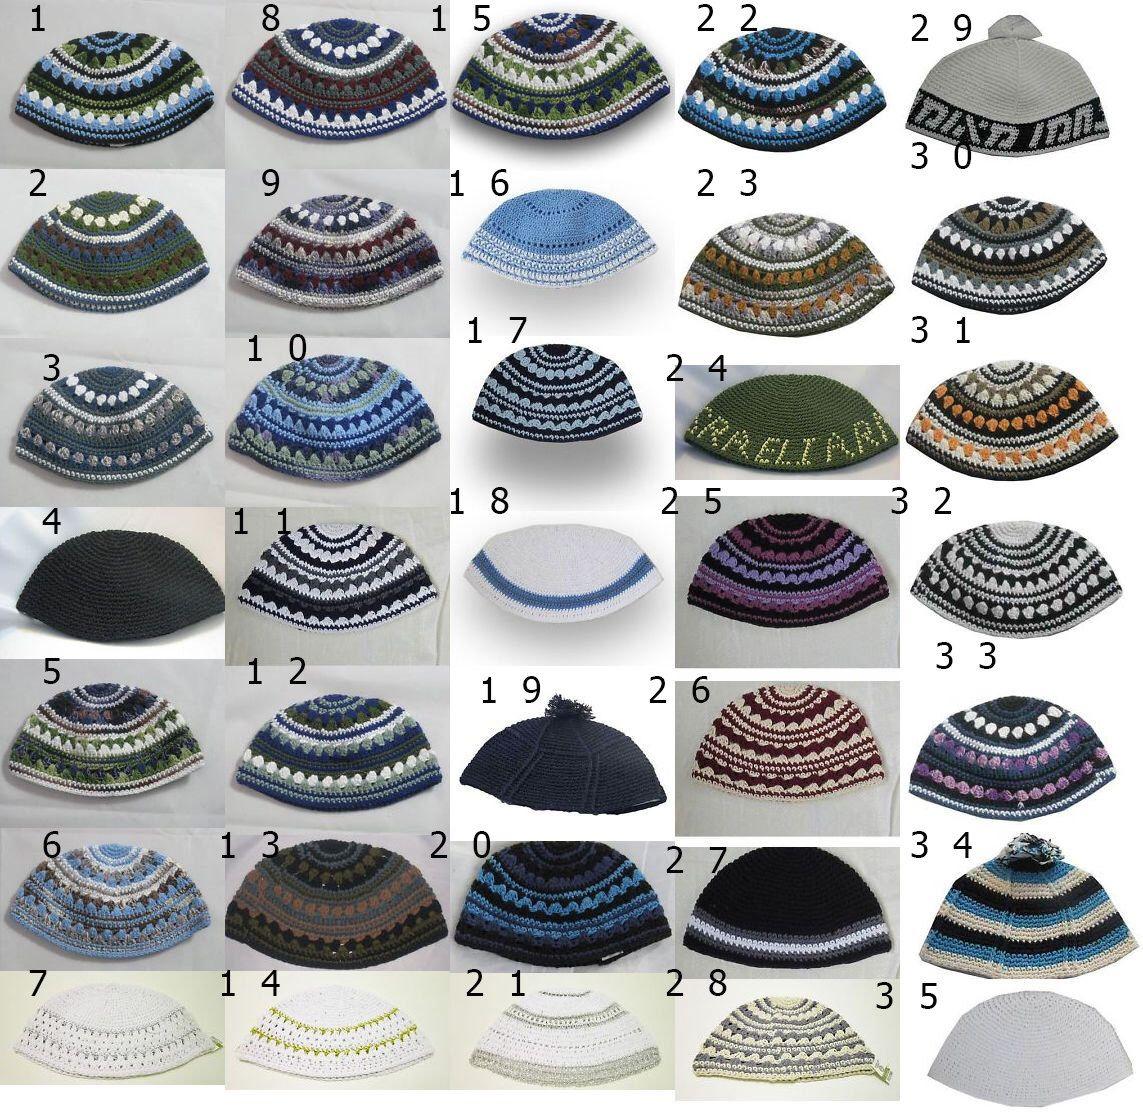 Hand Made Frik Kippah Yarmulke Jewish Judaica Hat Magen David Cap ...